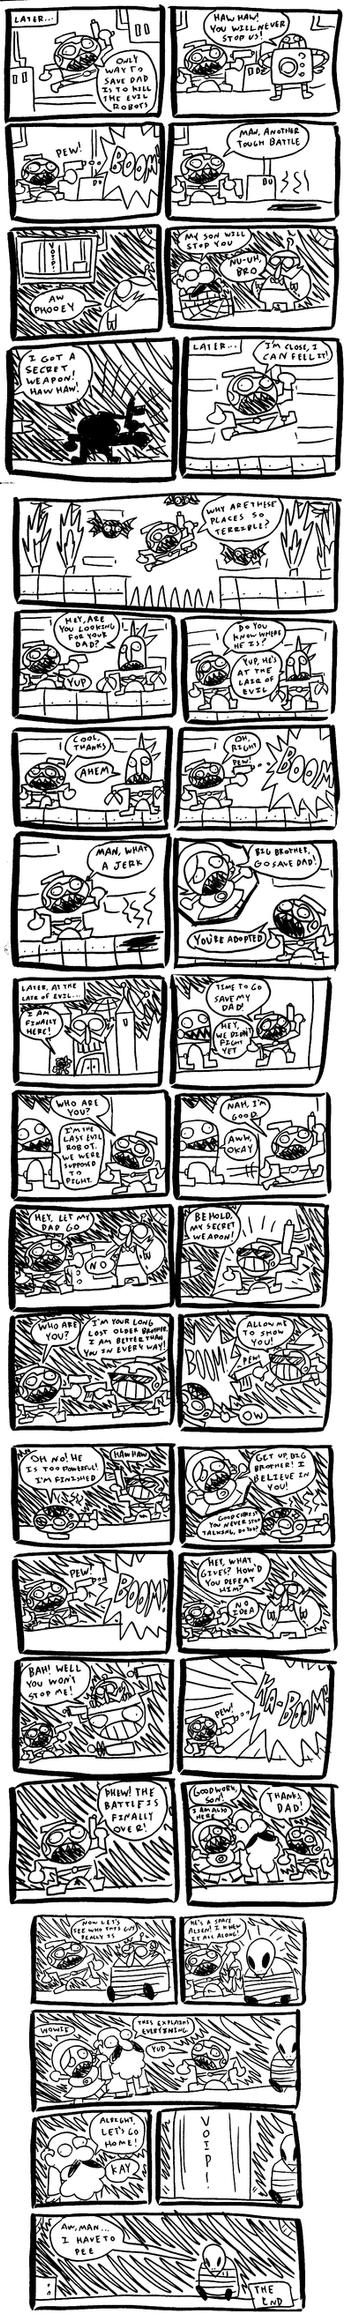 Astro Bastard Pages 6 - 10 by MichaelJLarson